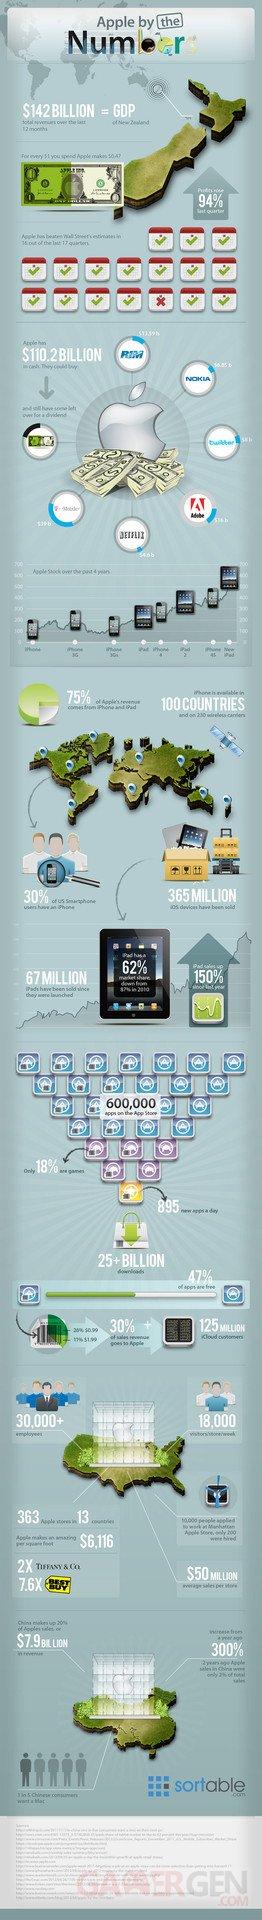 sortable-chiffre-affaire-apple-infographie